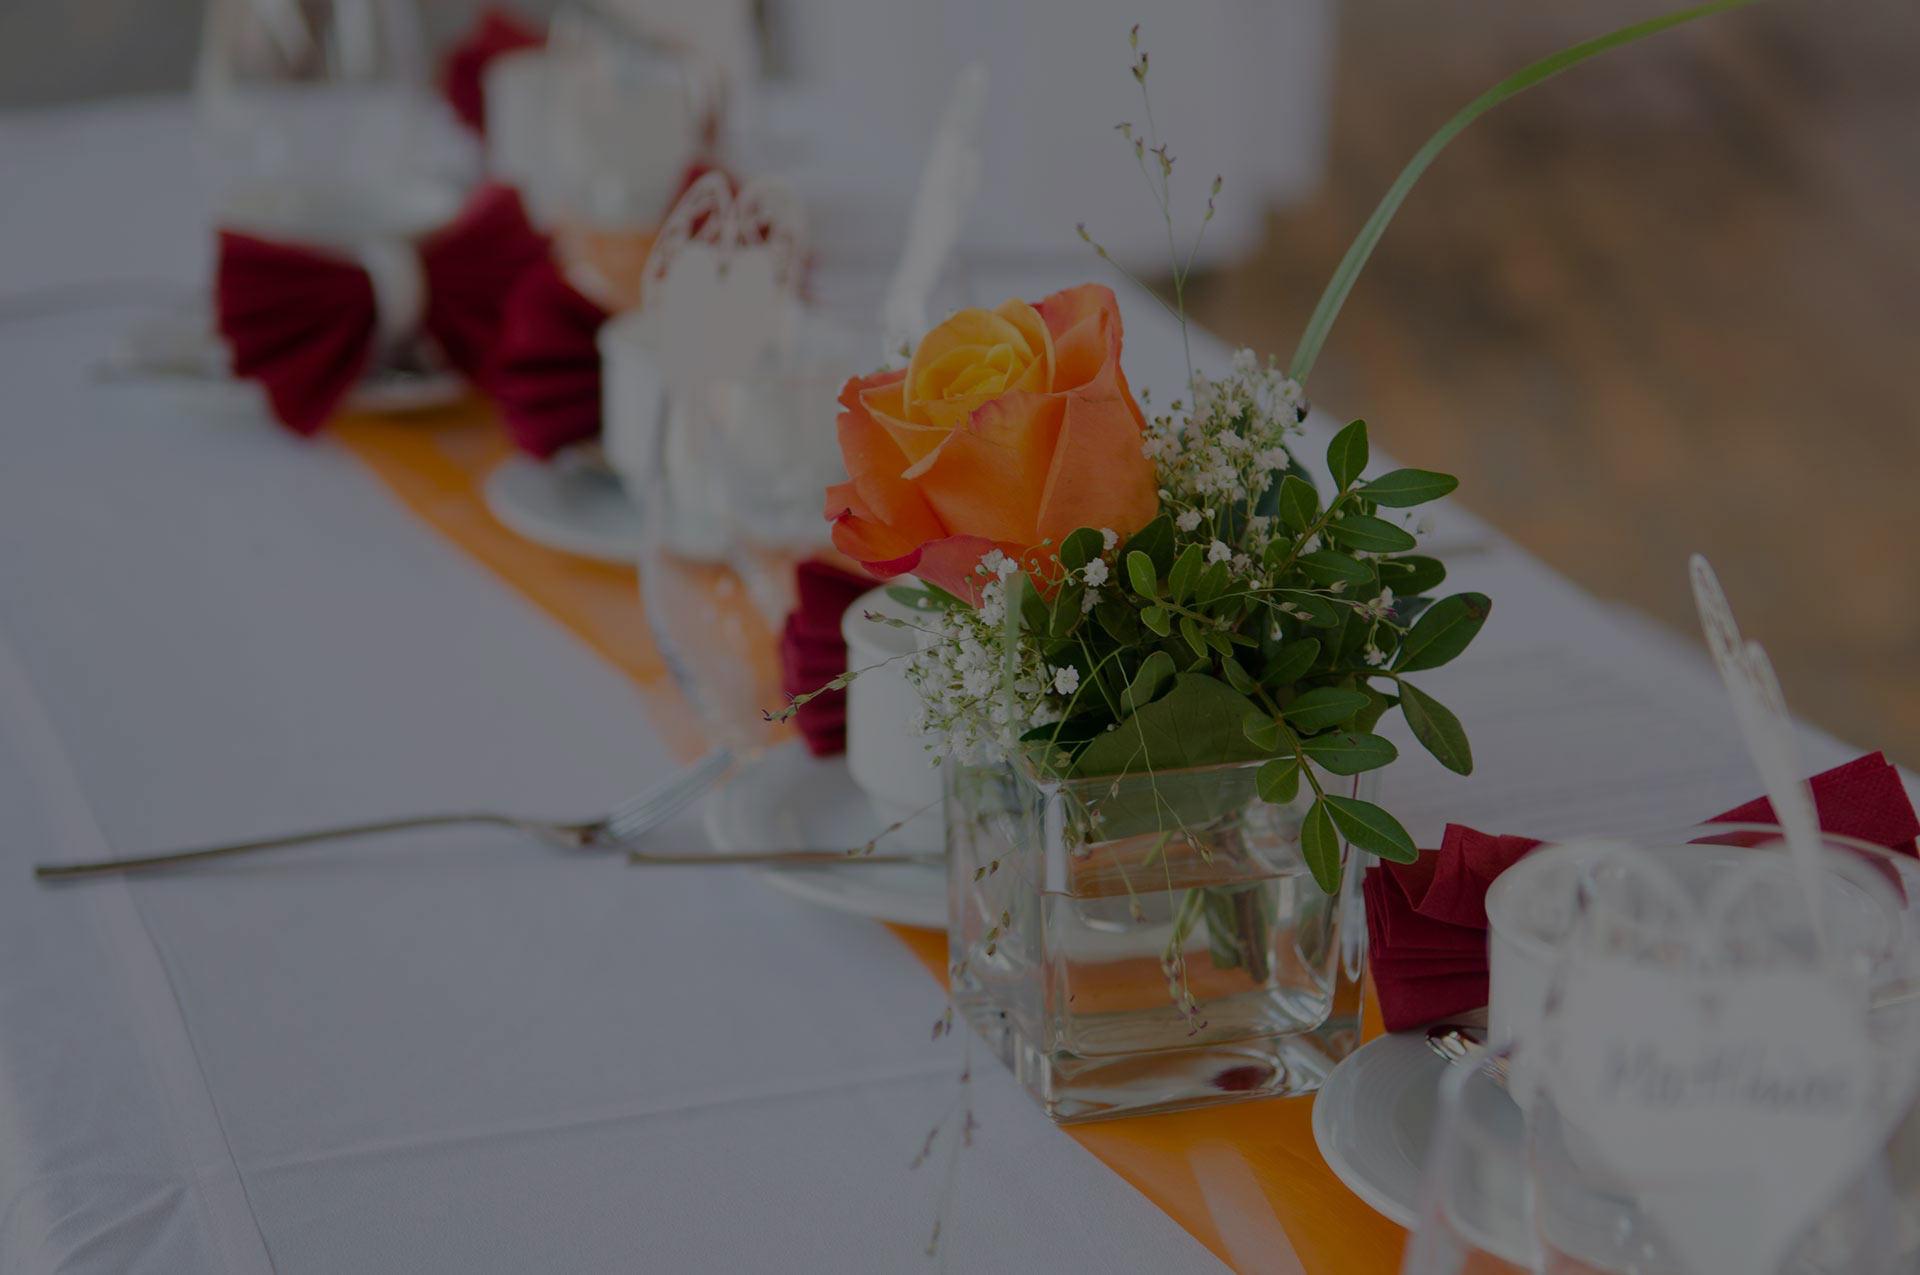 Eventservice Haas UG - Dekoration mieten